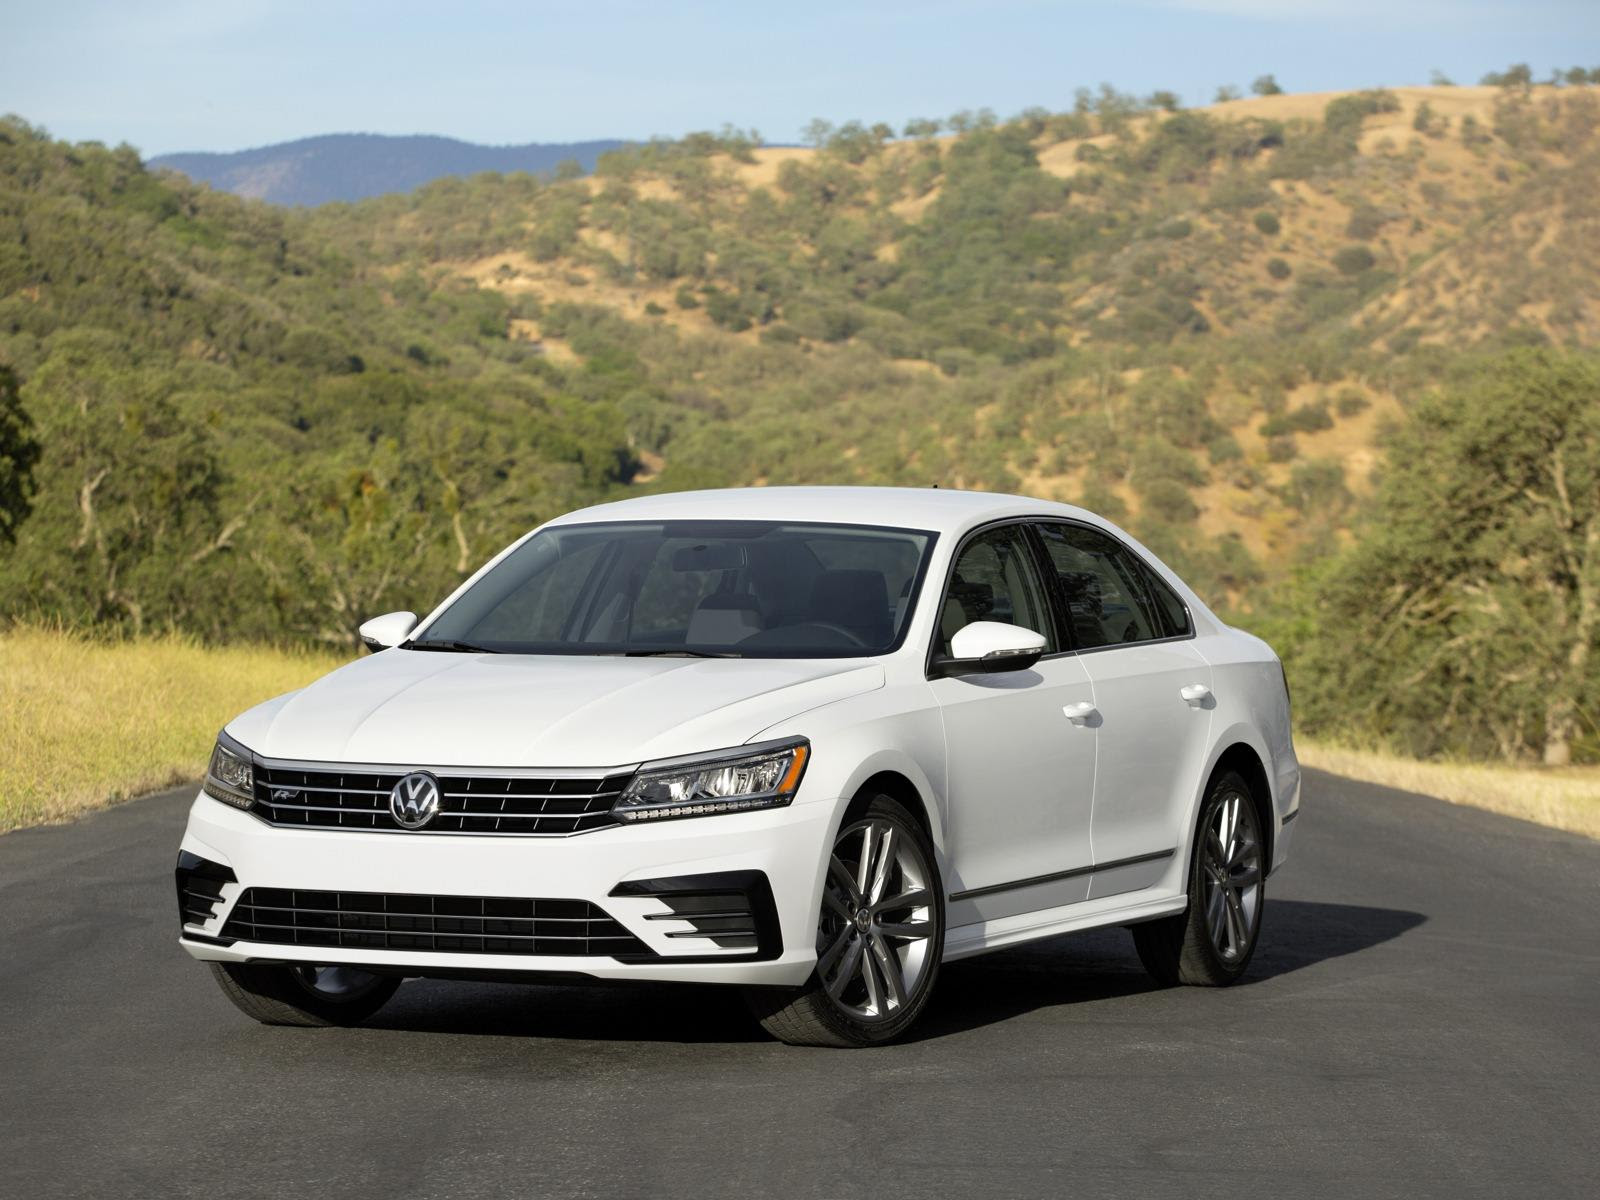 Volkswagen Passat 2016 a prueba - Autocosmos.com